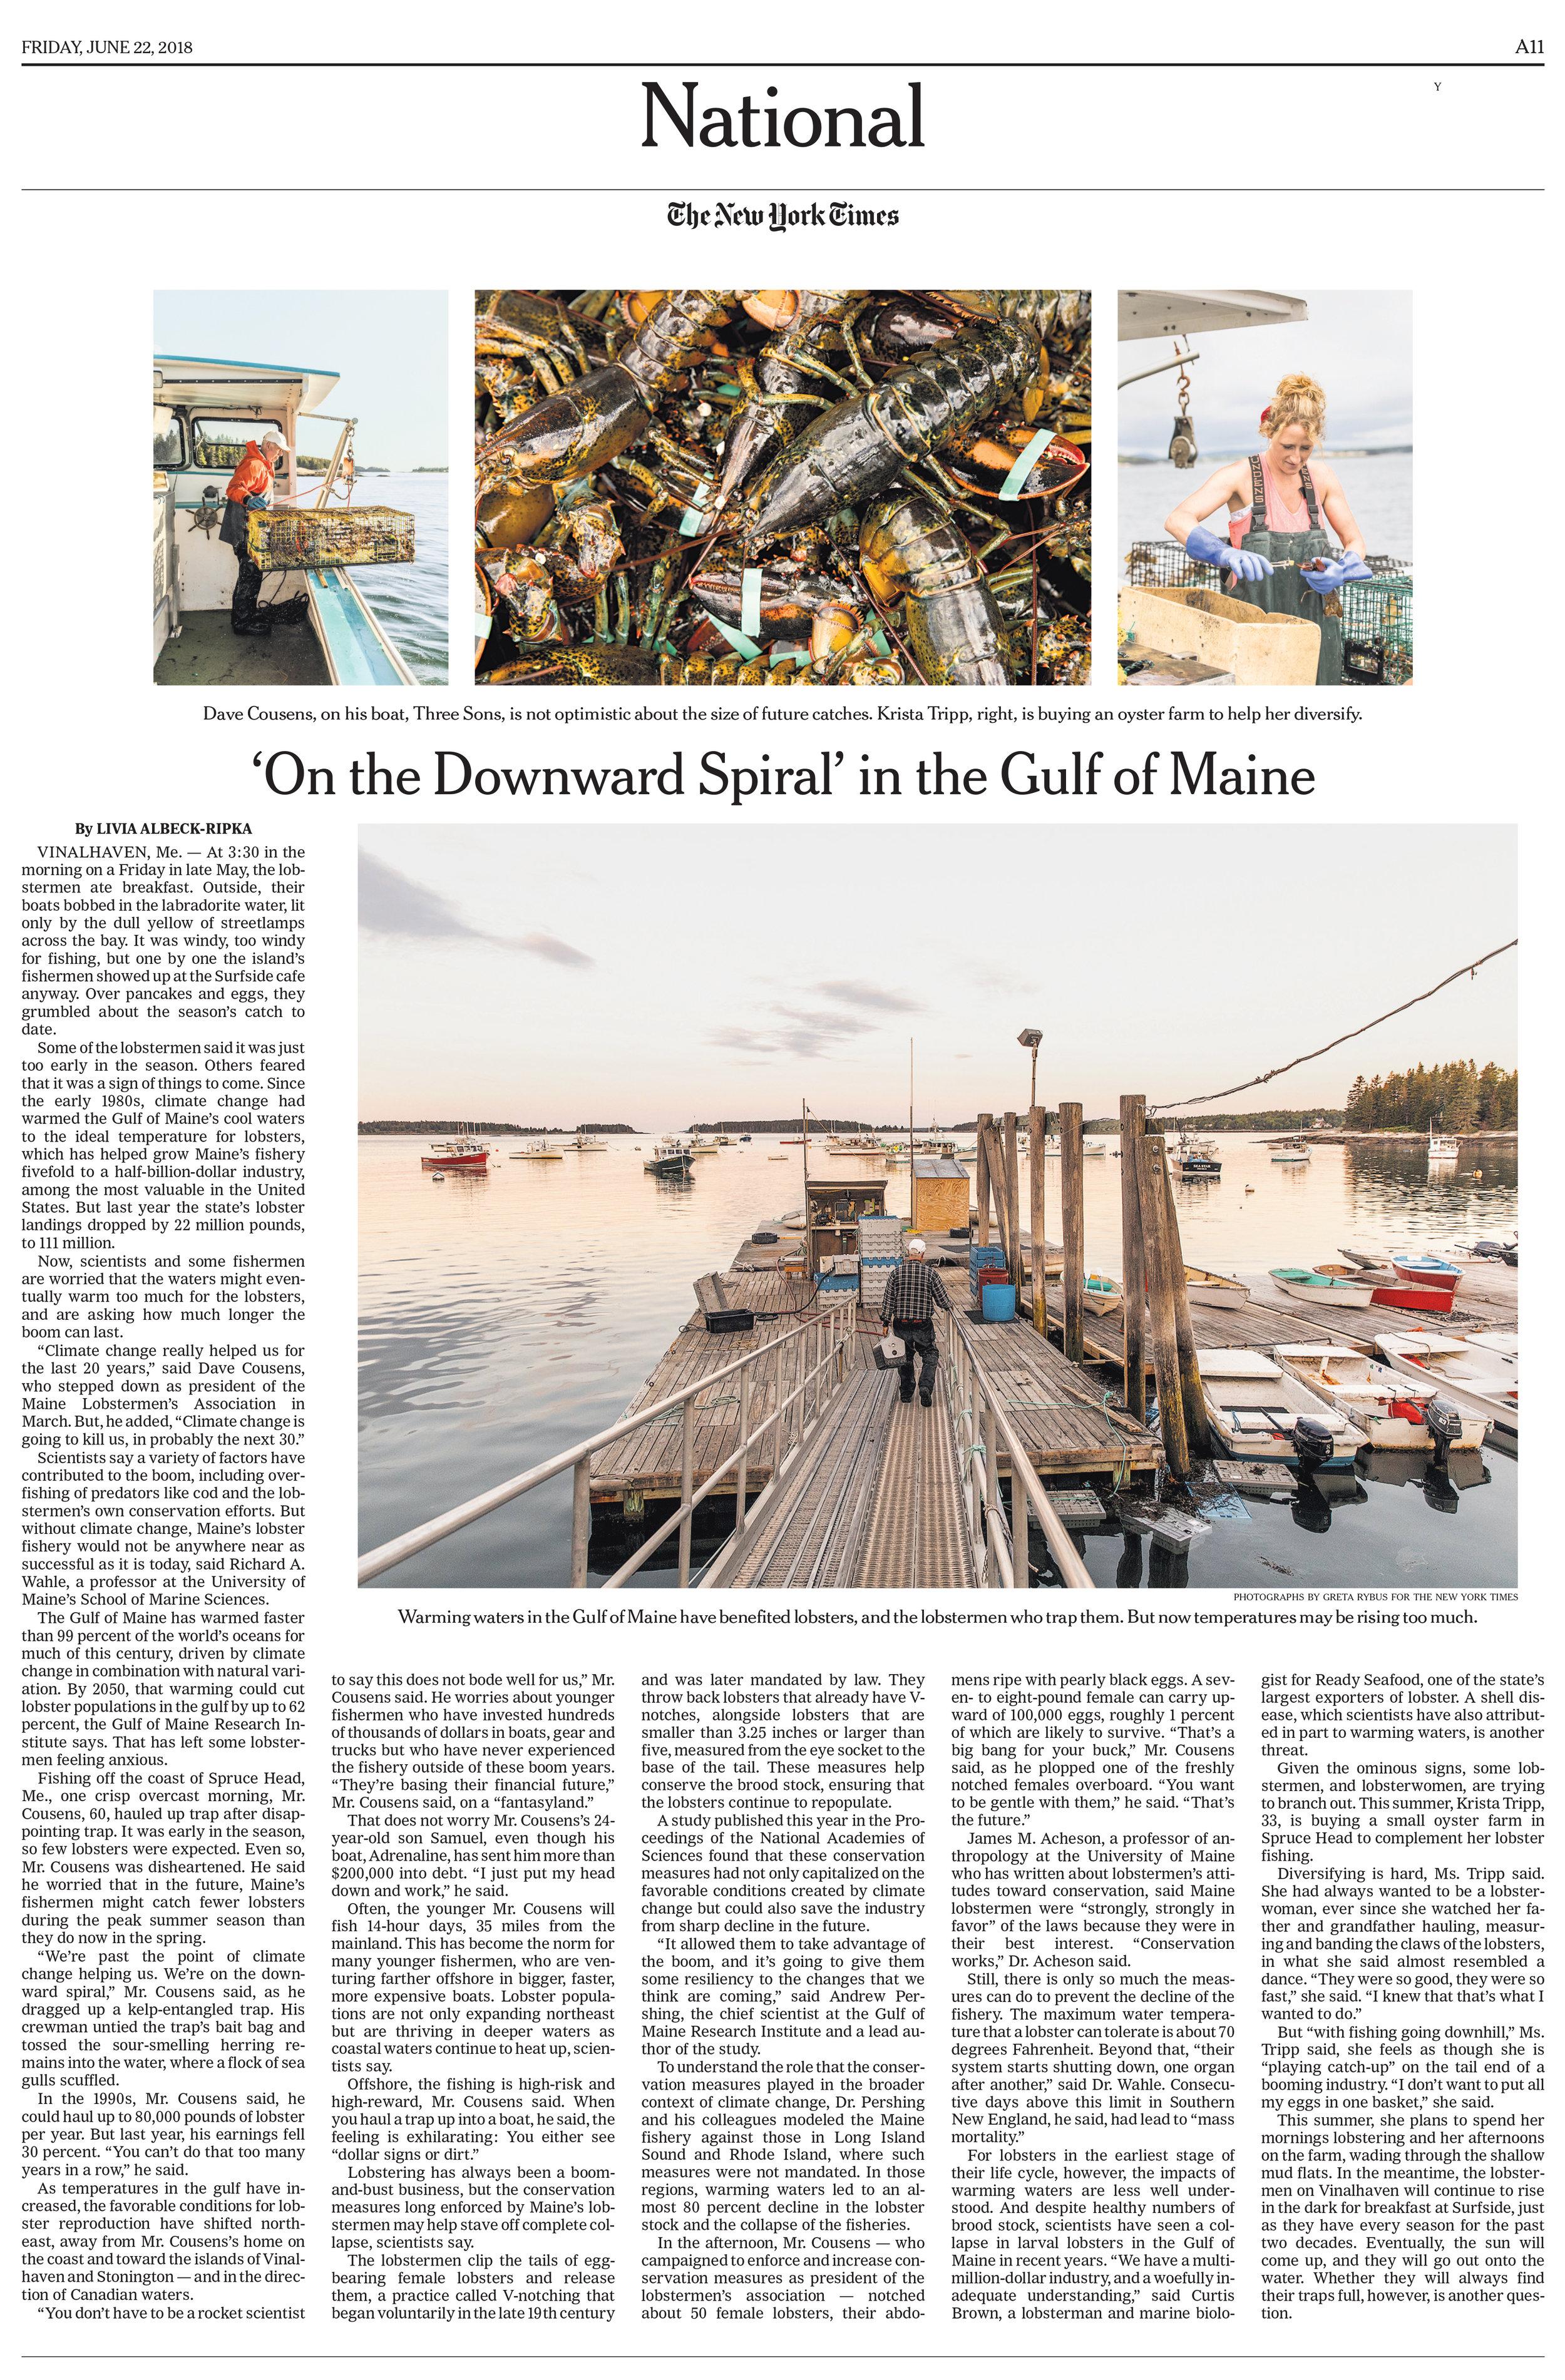 NYT-Climate-lobster 2-1.jpg